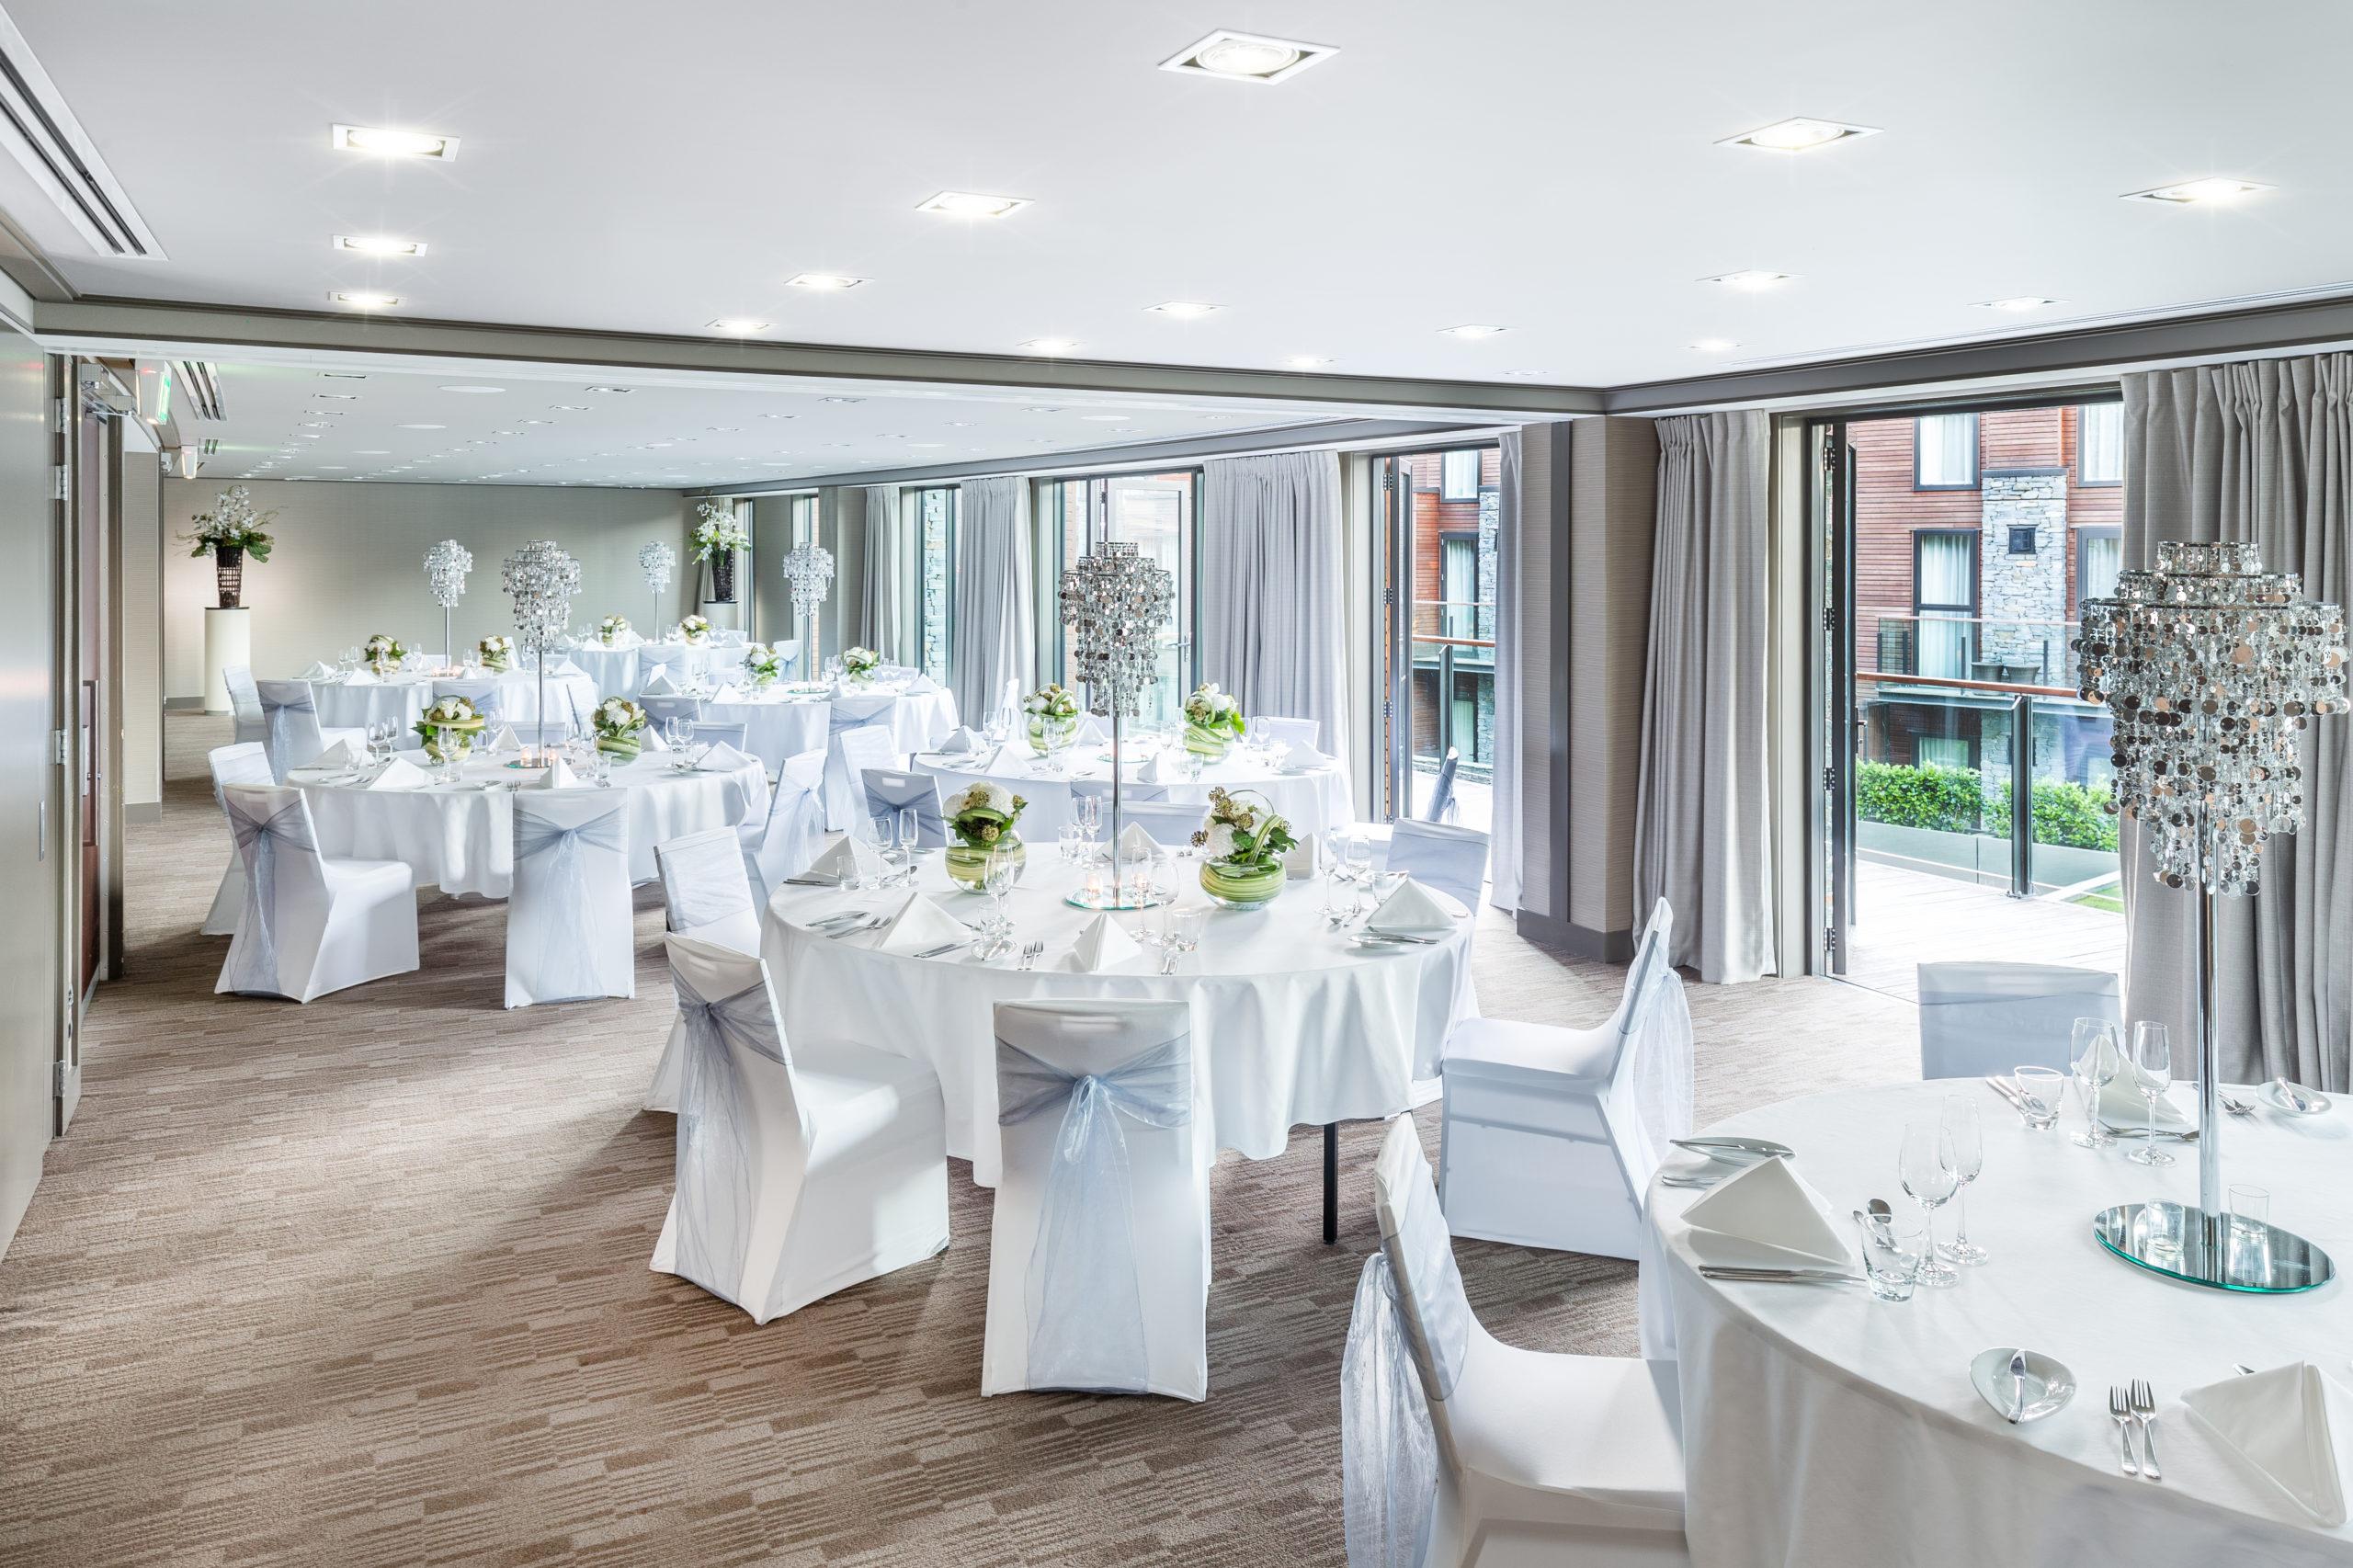 Coronet Room - Wedding - The Hilton Resort and Spa